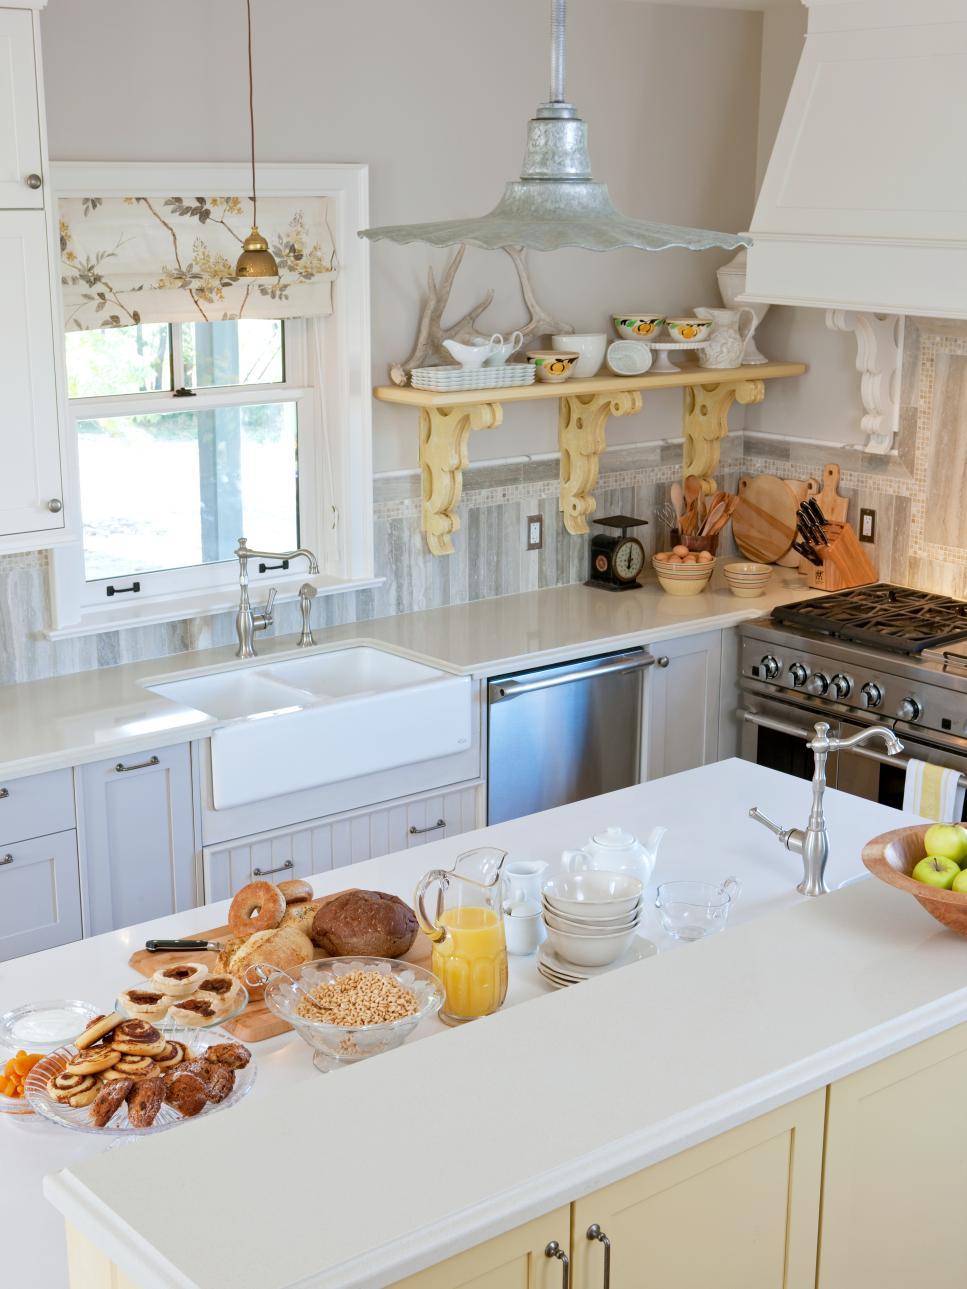 Designer Kitchens For Less Hgtv Designer Kitchens A Supply Only Kitchens